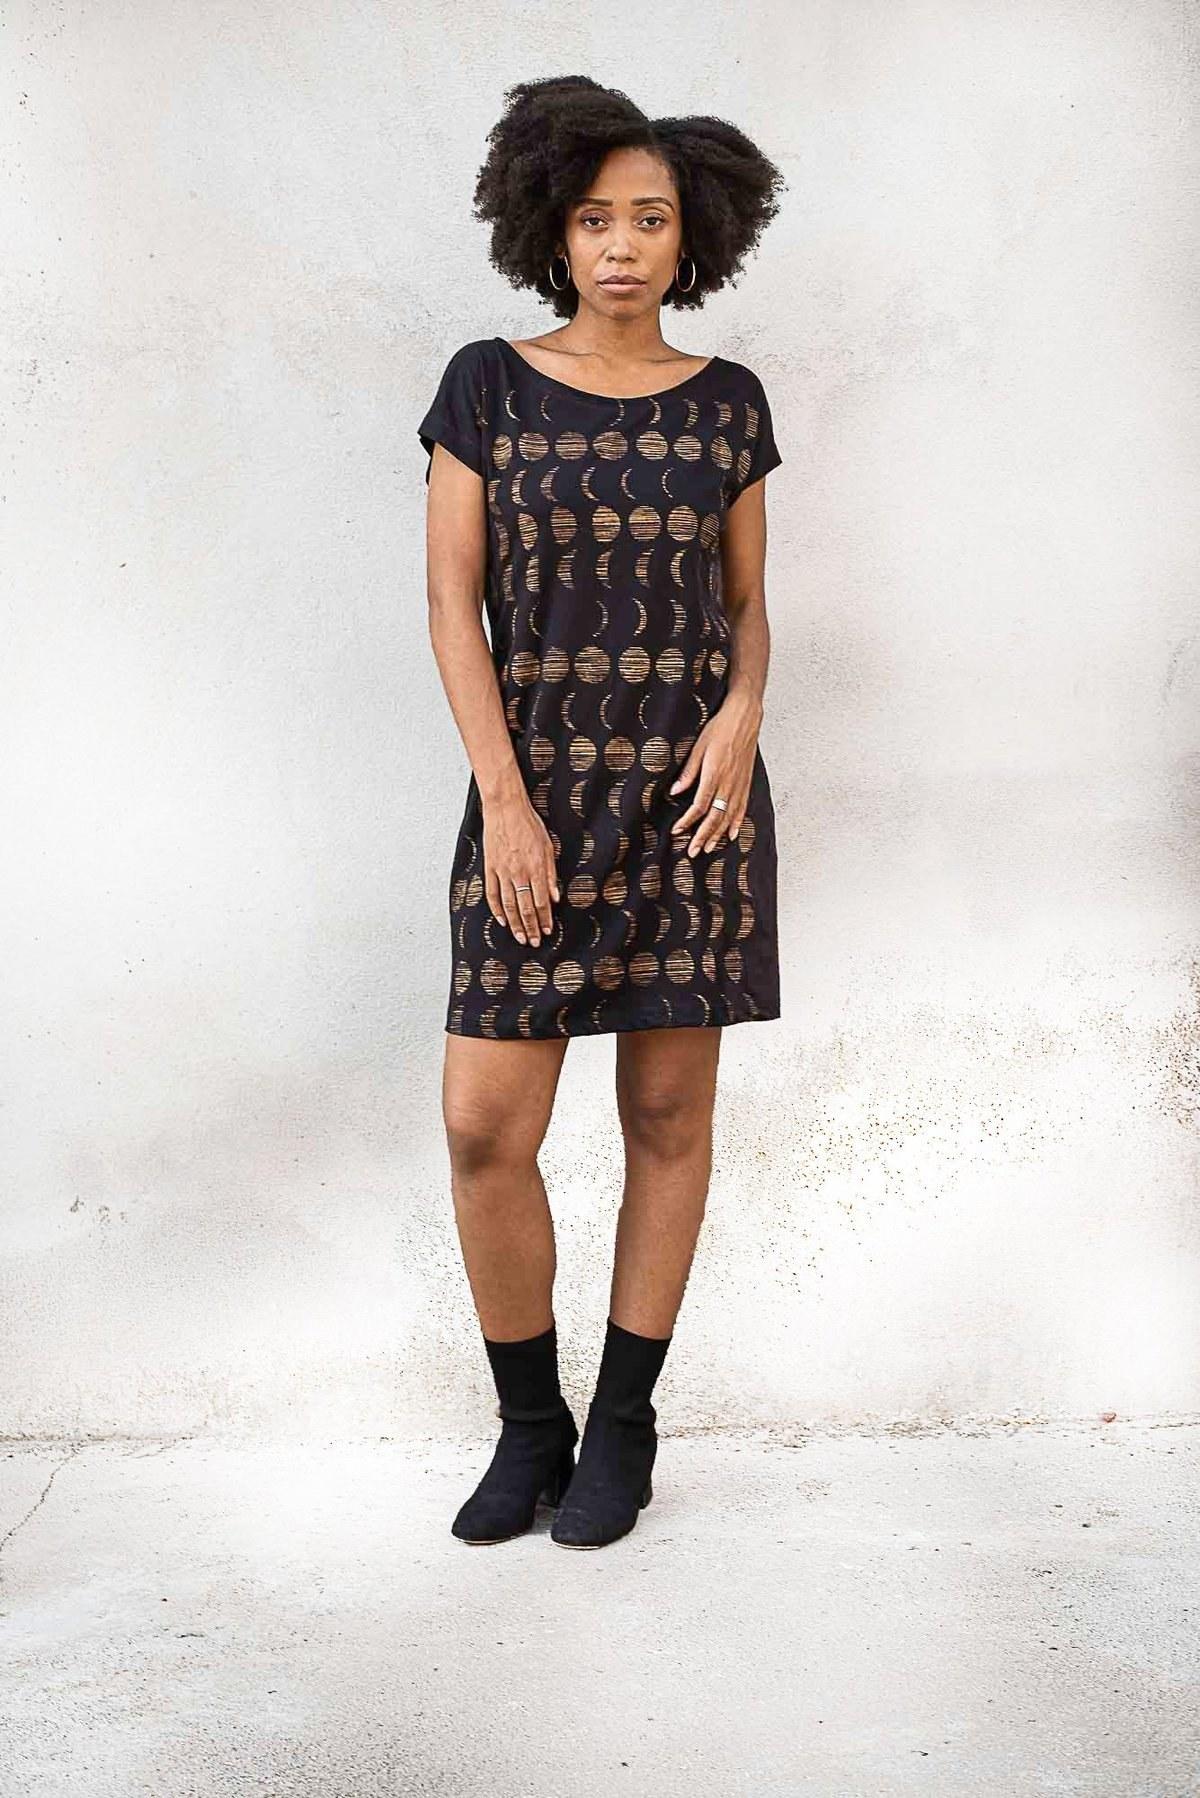 model wearing black mini t-shirt dress